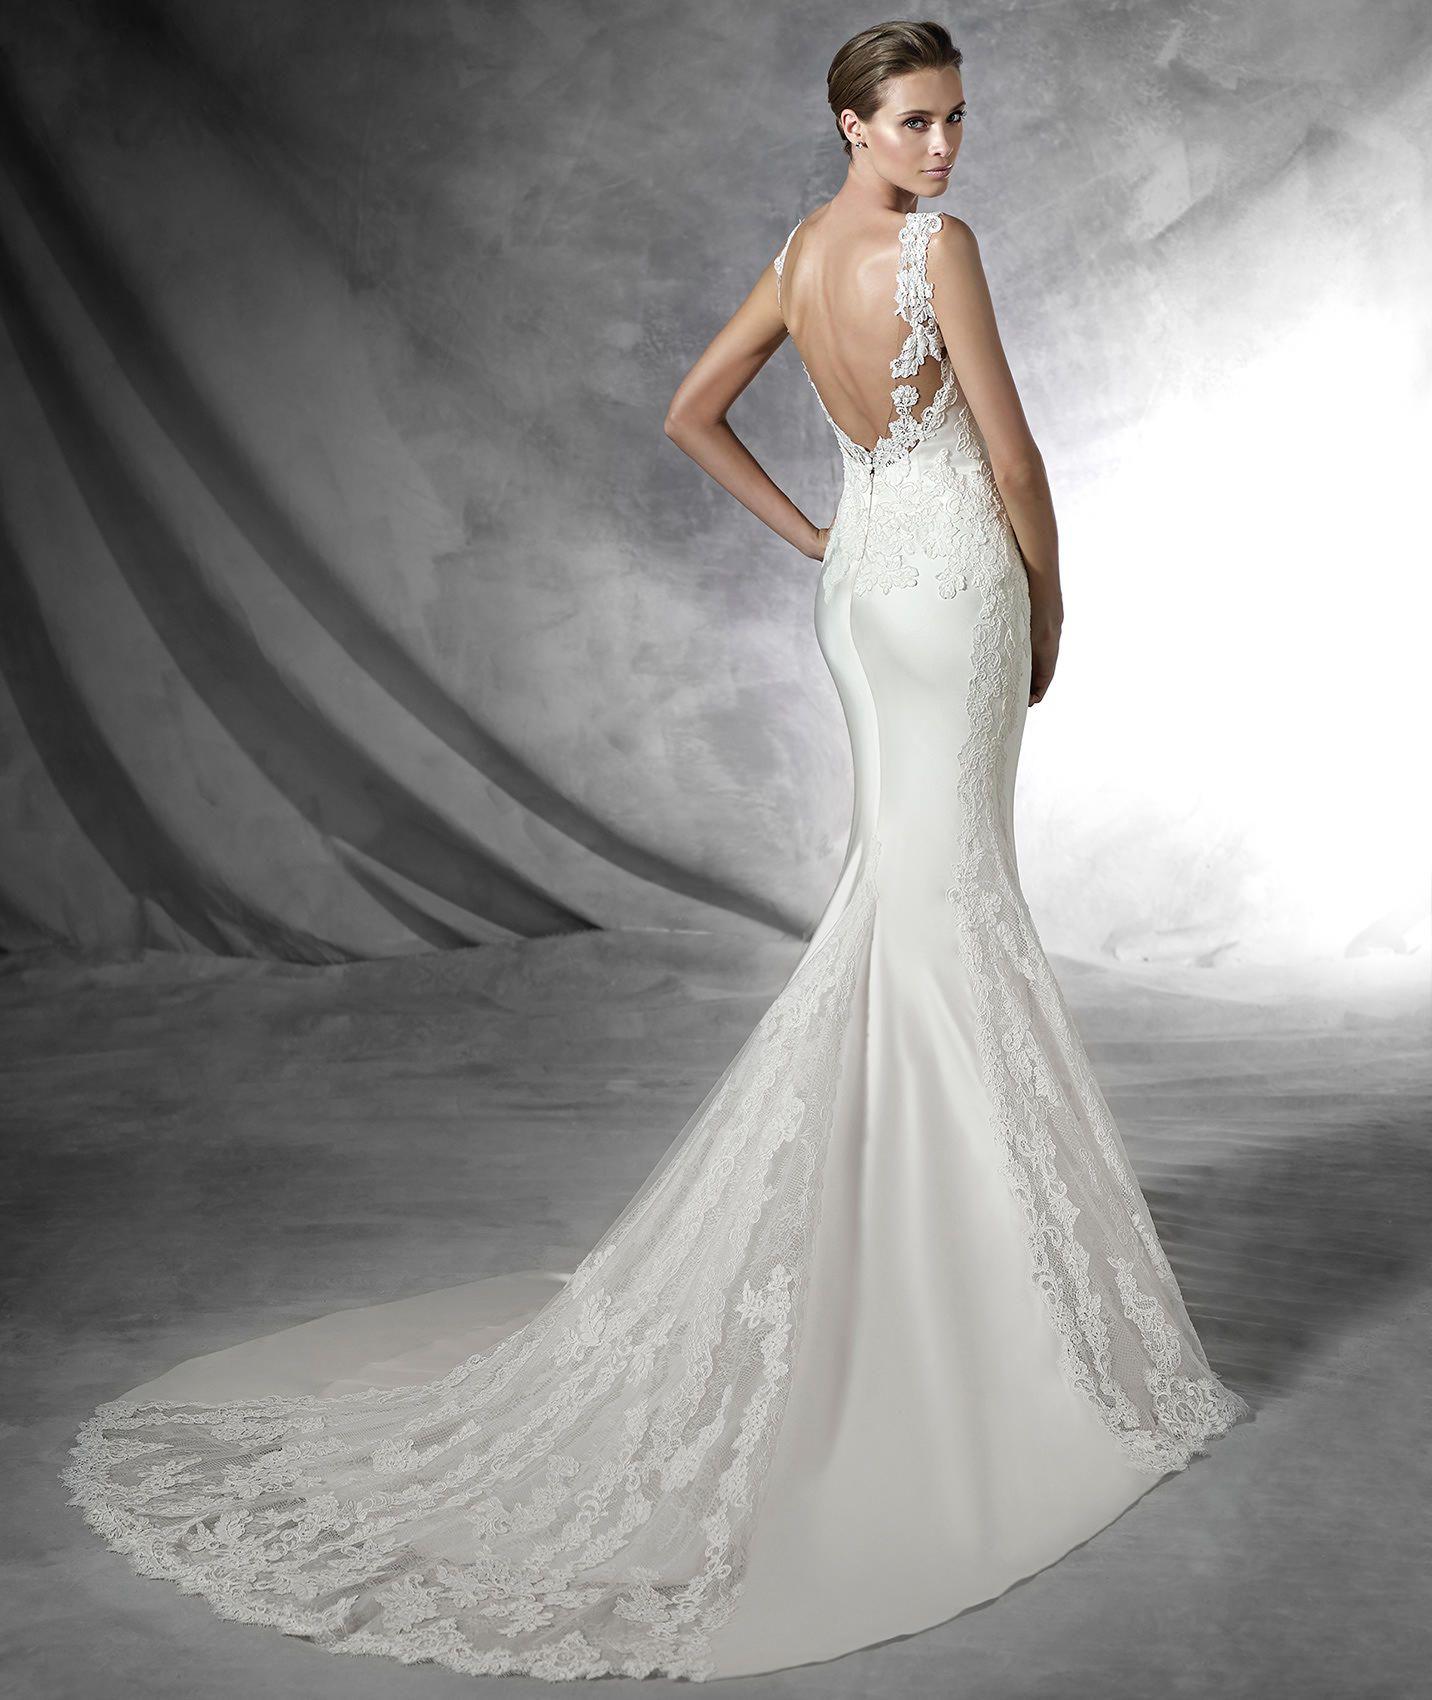 Brautkleid Im Meerjungfrau-Stil Mit Herzförmigem